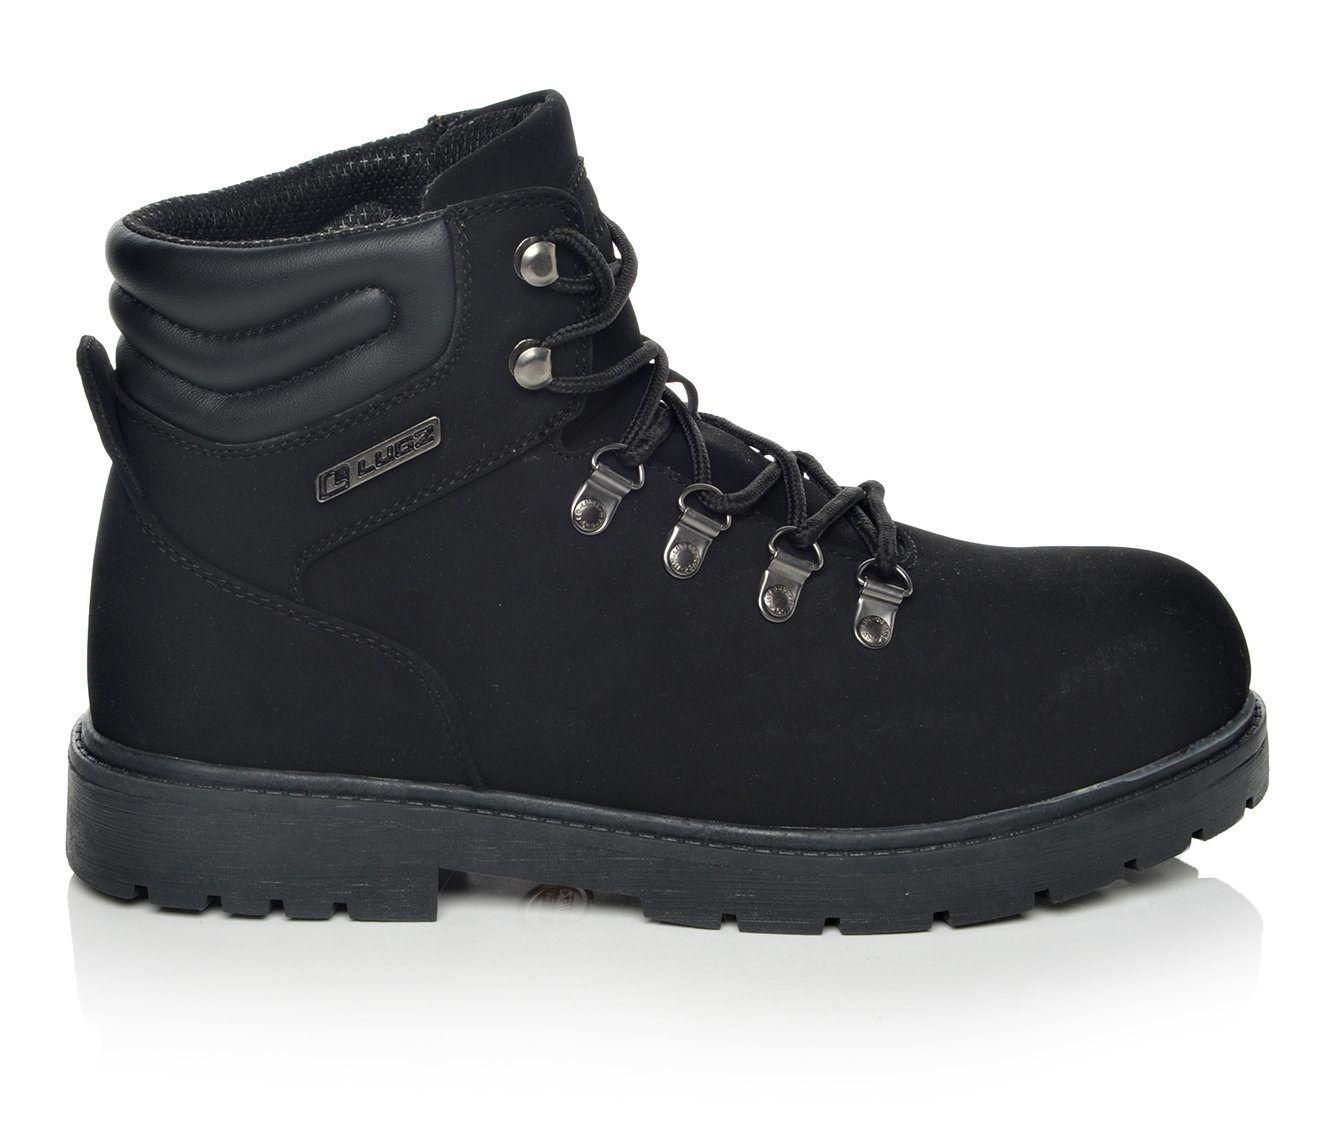 Men's Lugz Grotto Boots Black